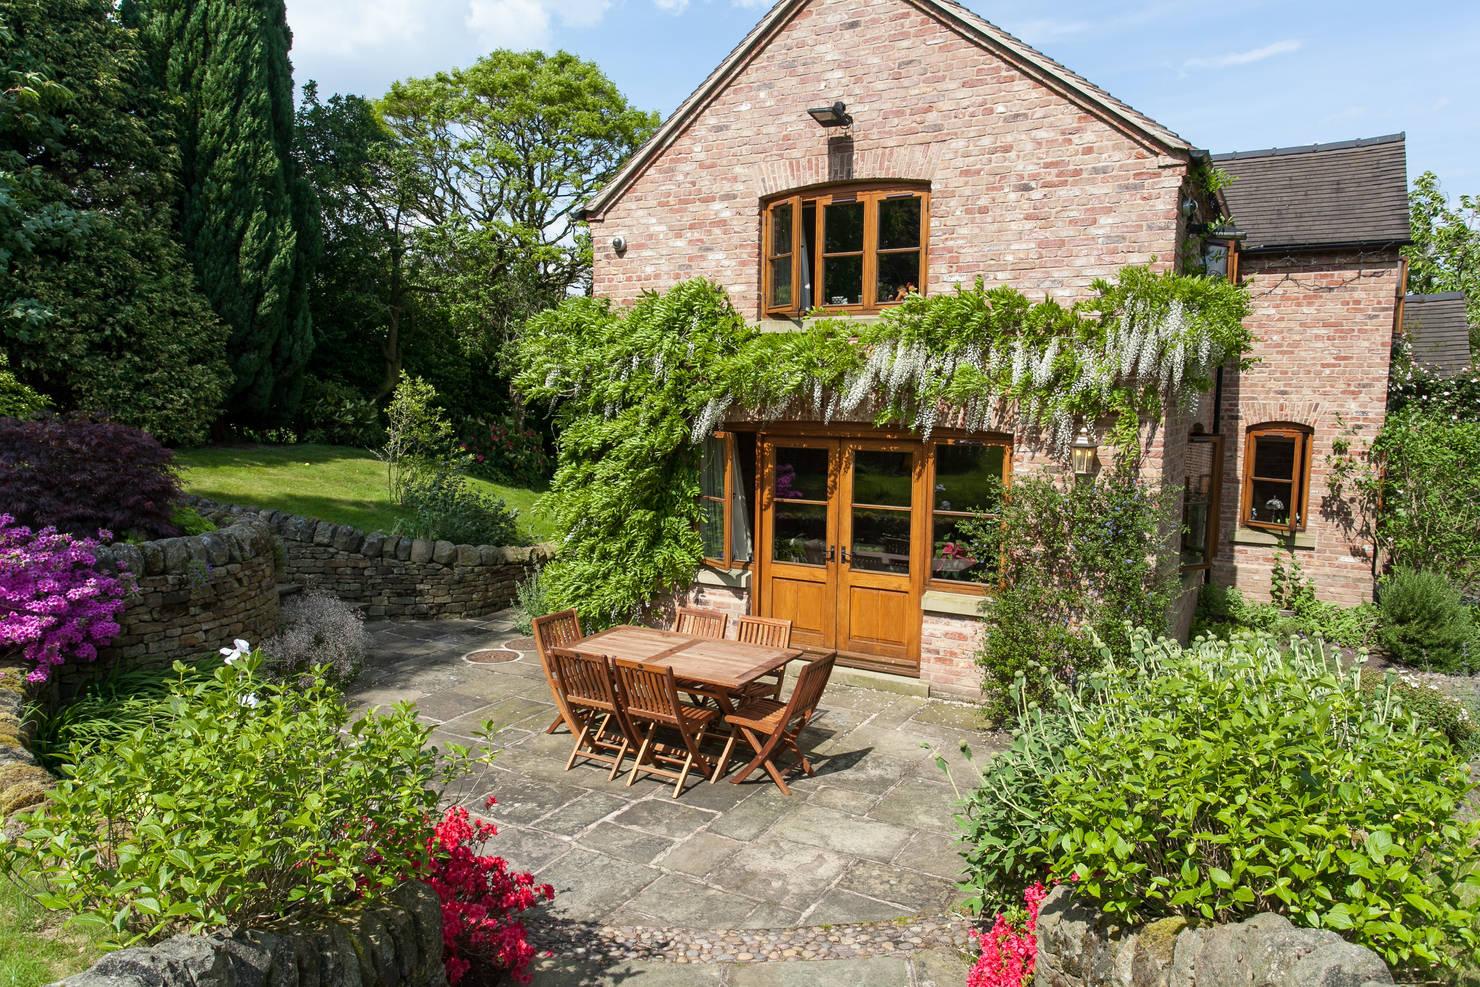 The Quintessential English Country Garden